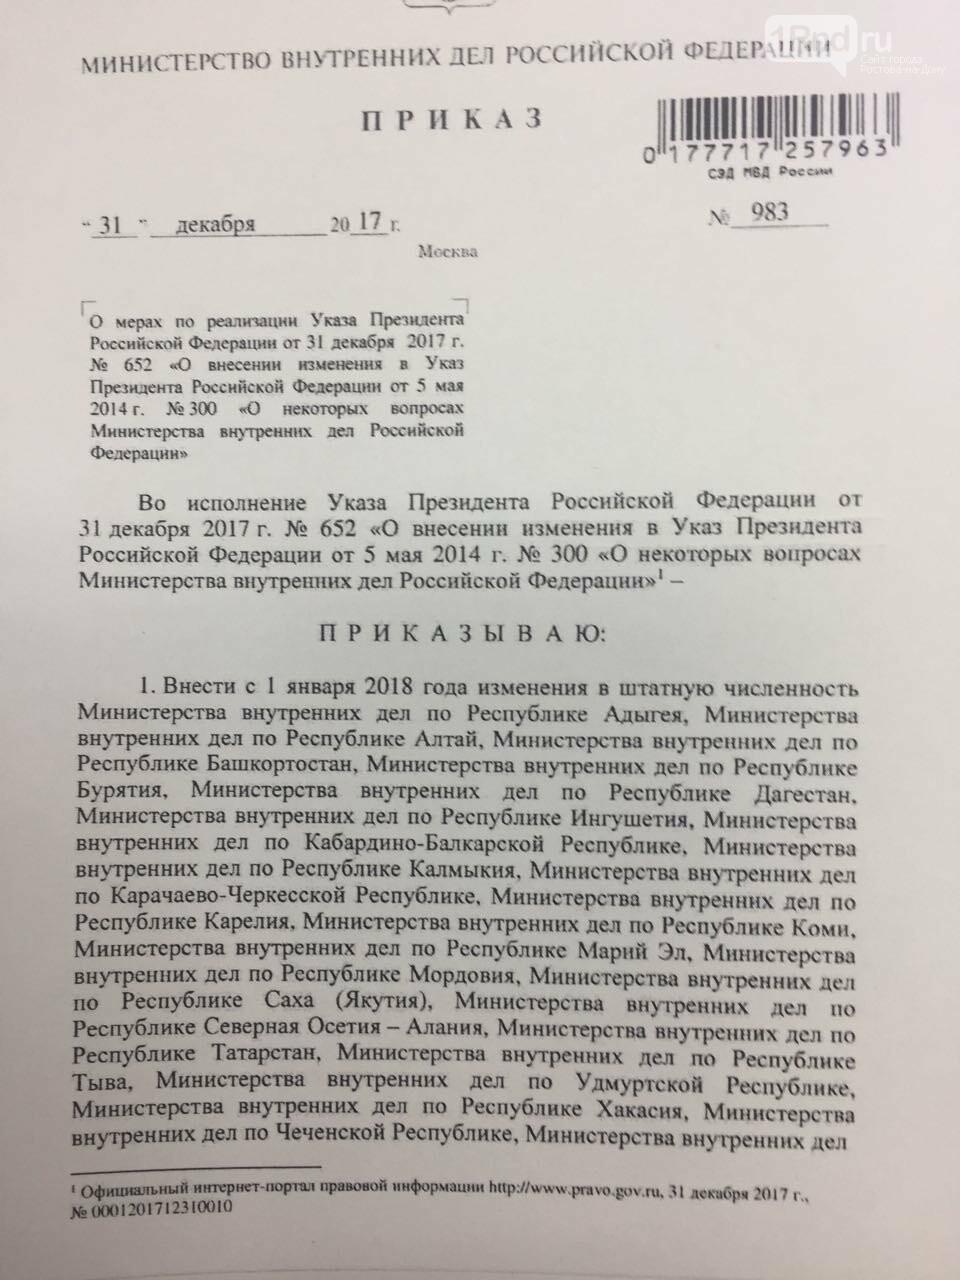 На Дону сократят сотрудников ГИБДД: указ подписал Владимир Путин, фото-1